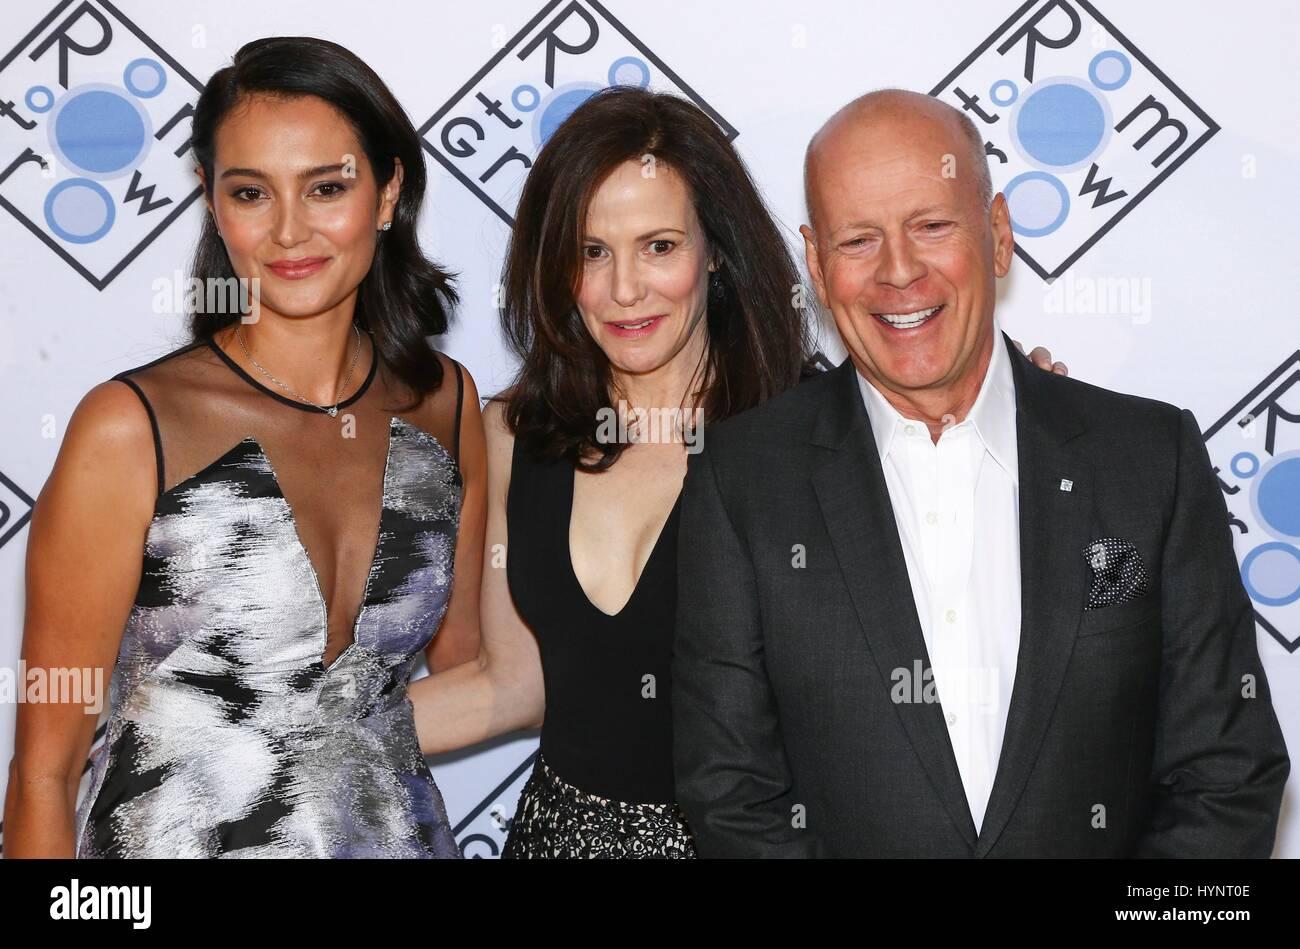 New York, NY, USA. 5ème apr 2017. Emma Hemming-Willis, Mary-Louise Parker, Bruce Willis aux arrivées de Photo Stock